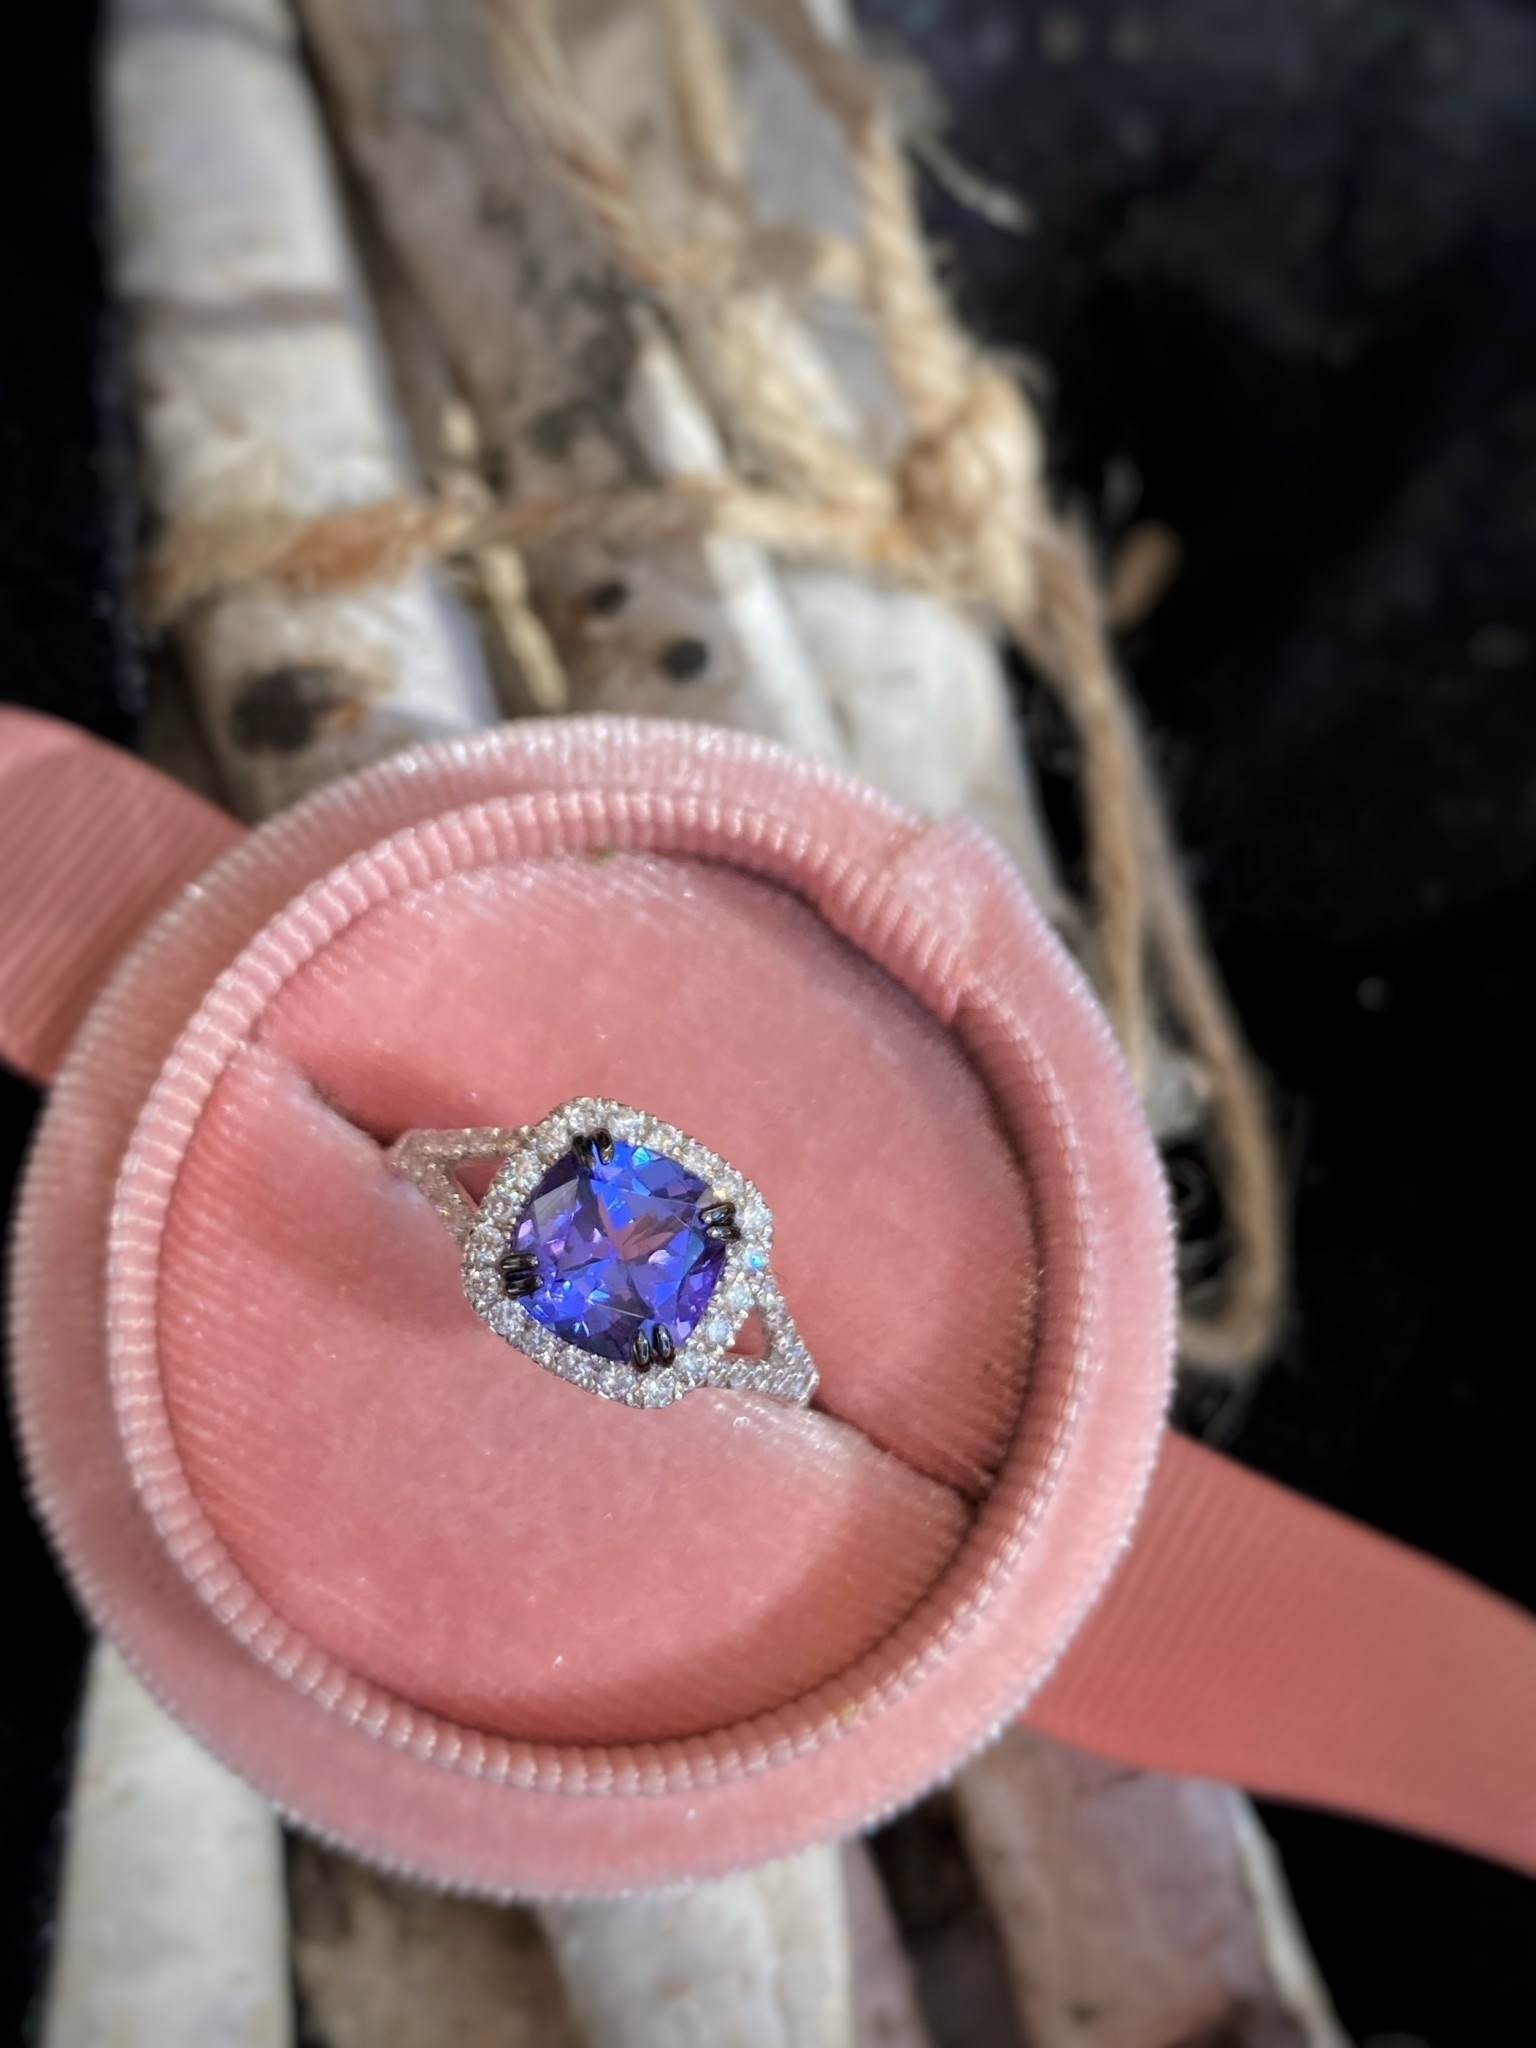 Tanzanite and Diamond Ring with Black Prongs